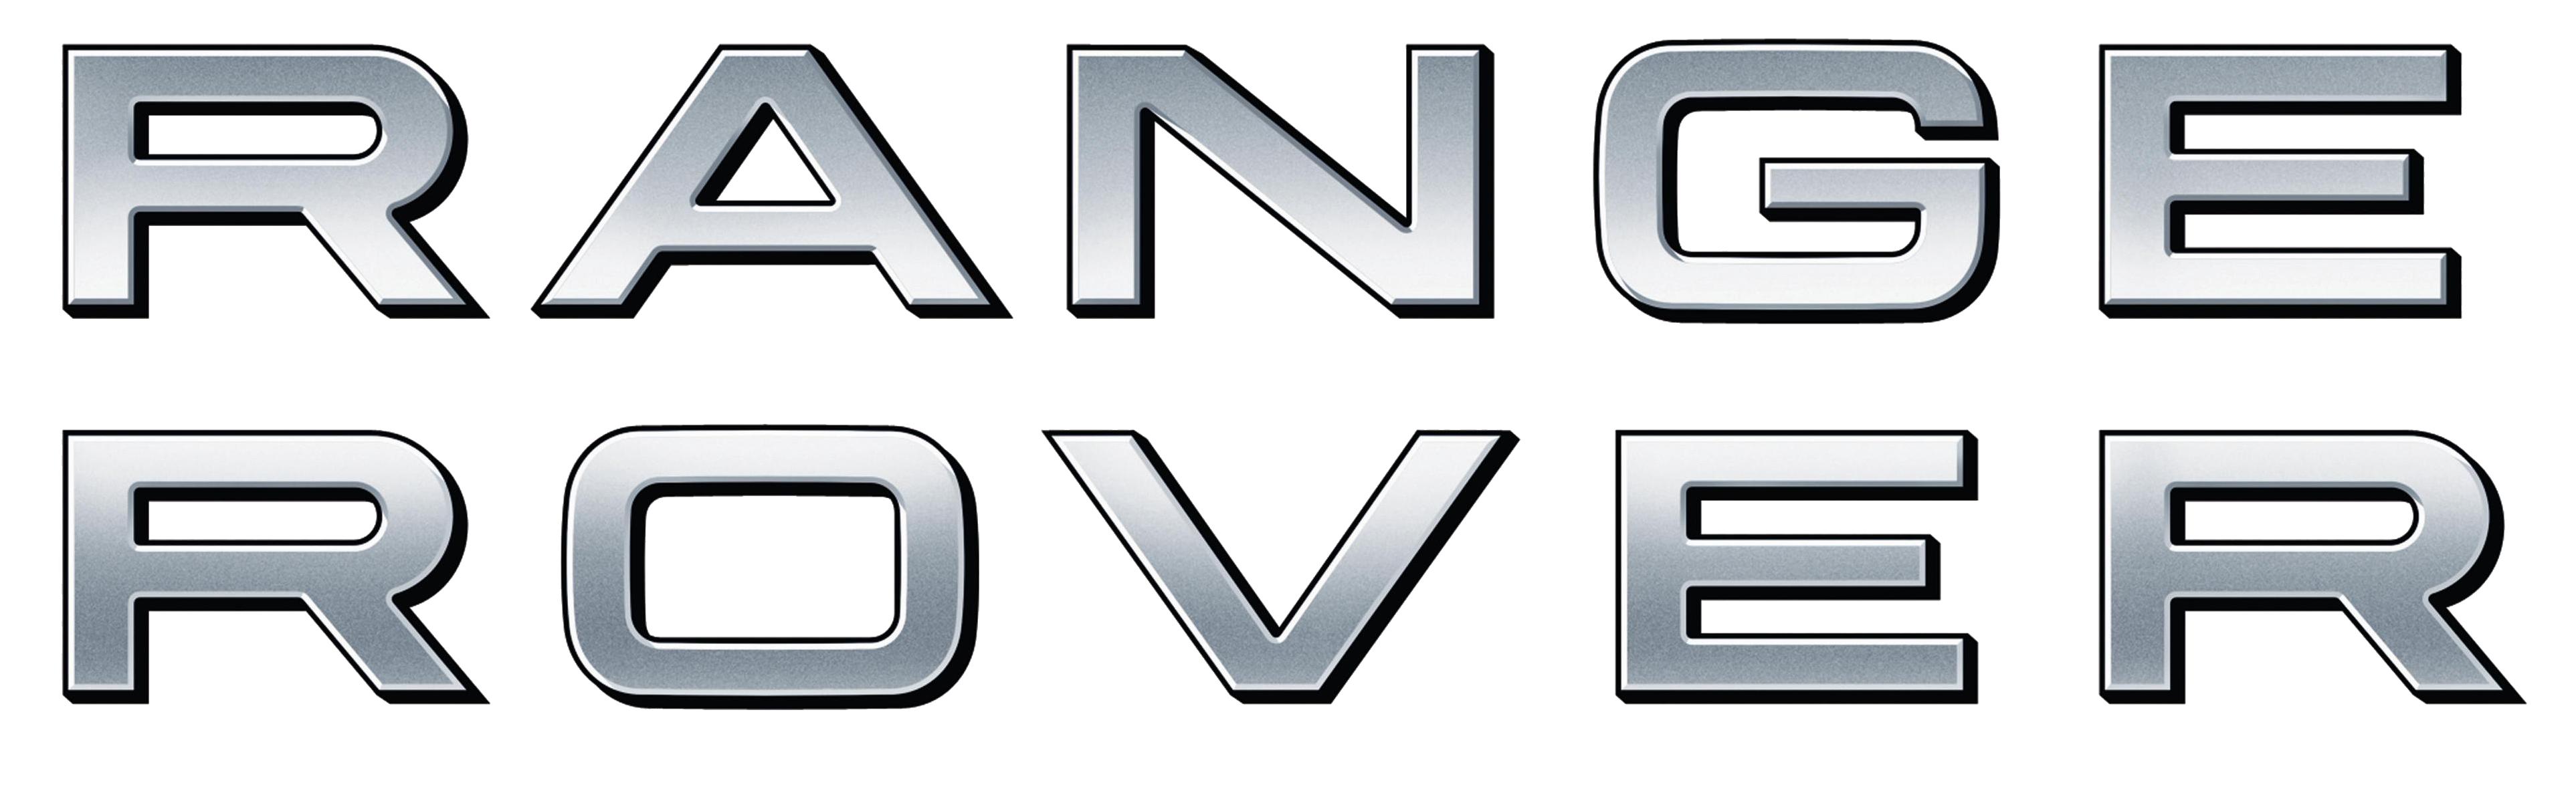 Bilelektronik Range Rover